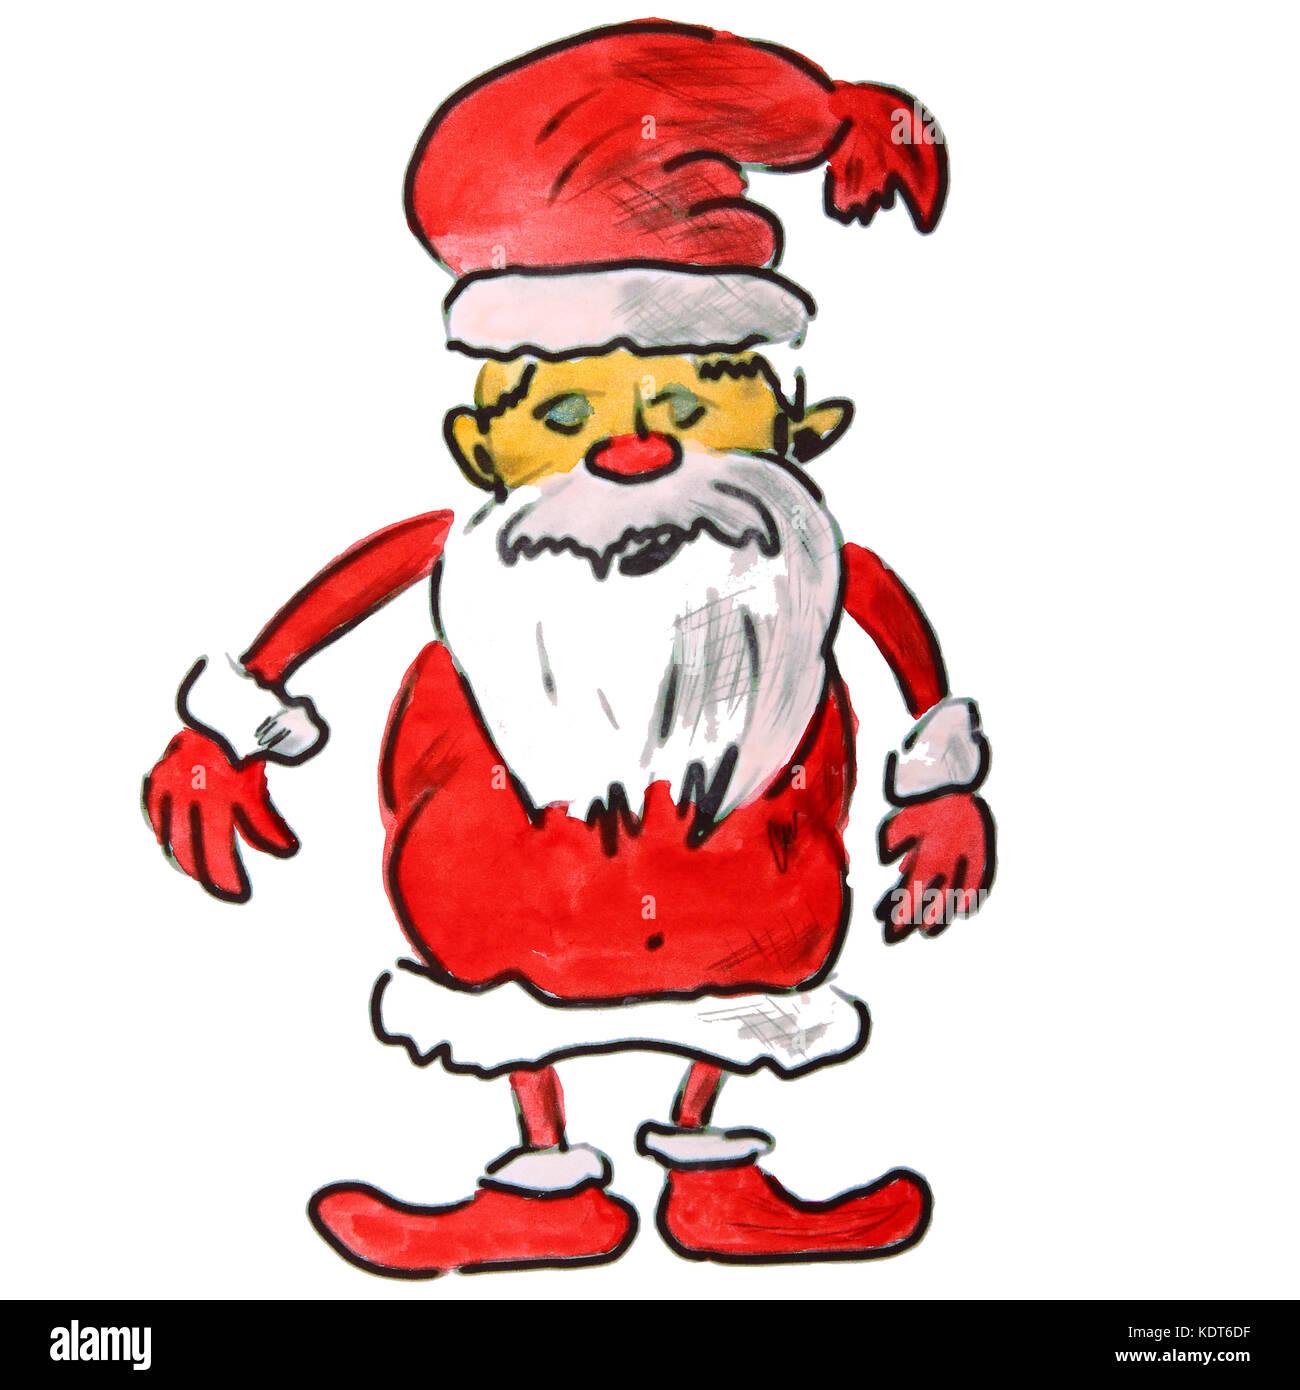 Watercolor Drawing Kids Cartoon Santa Claus On A White Backgroun